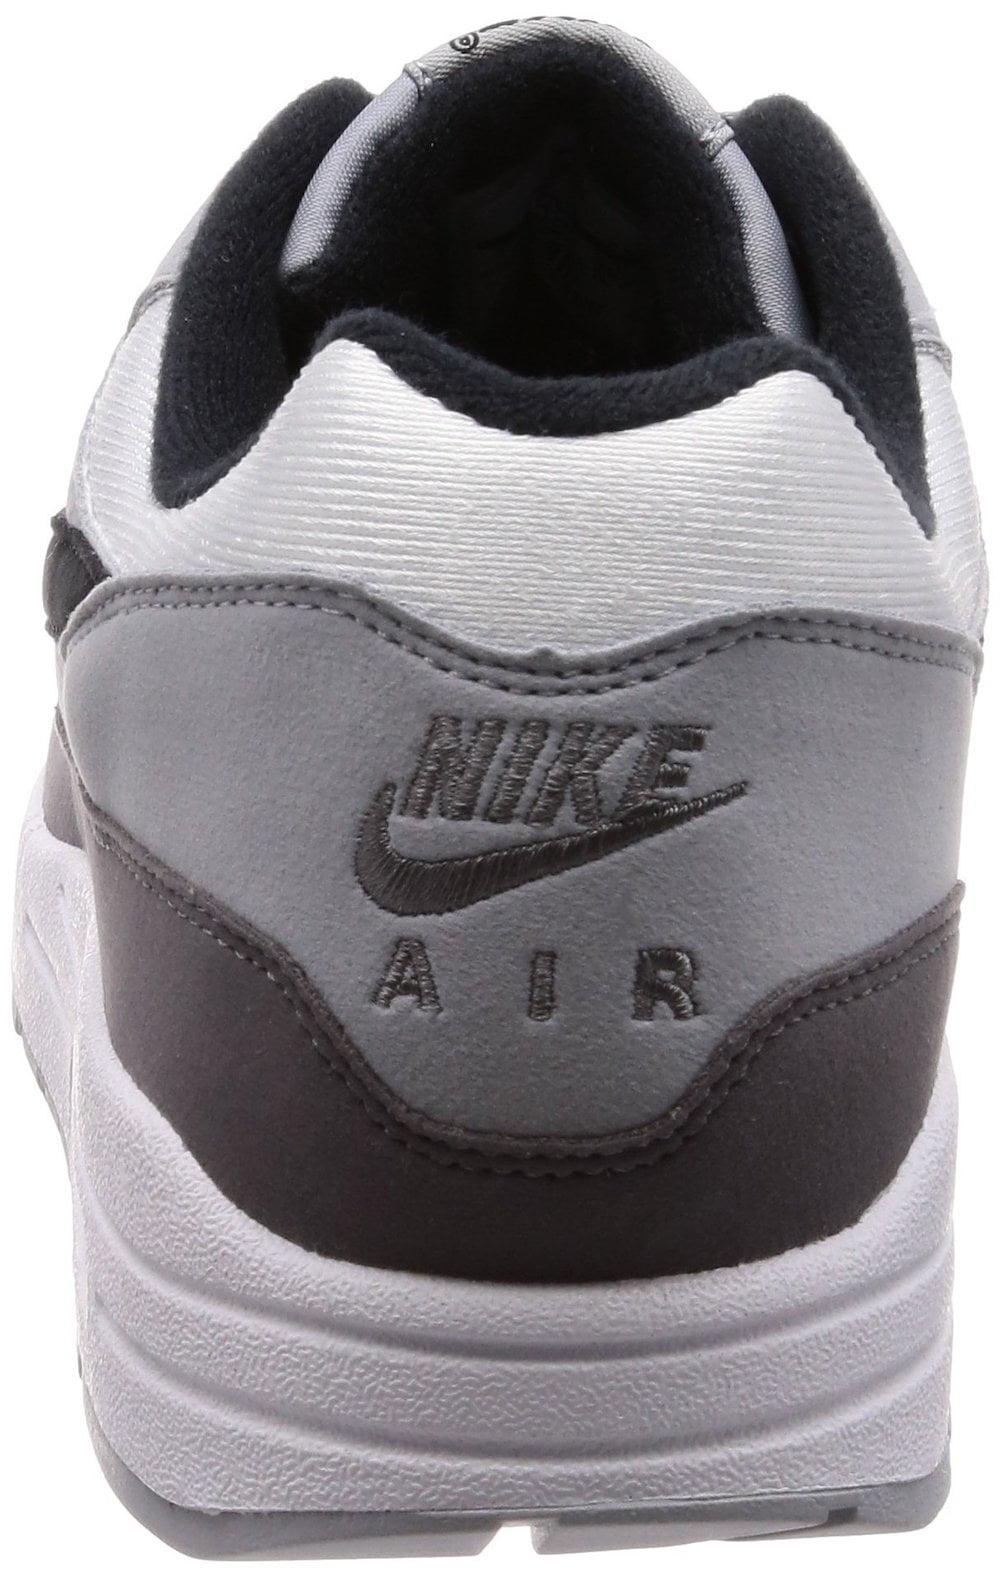 Nike Men's Air Max 1 Running Shoe